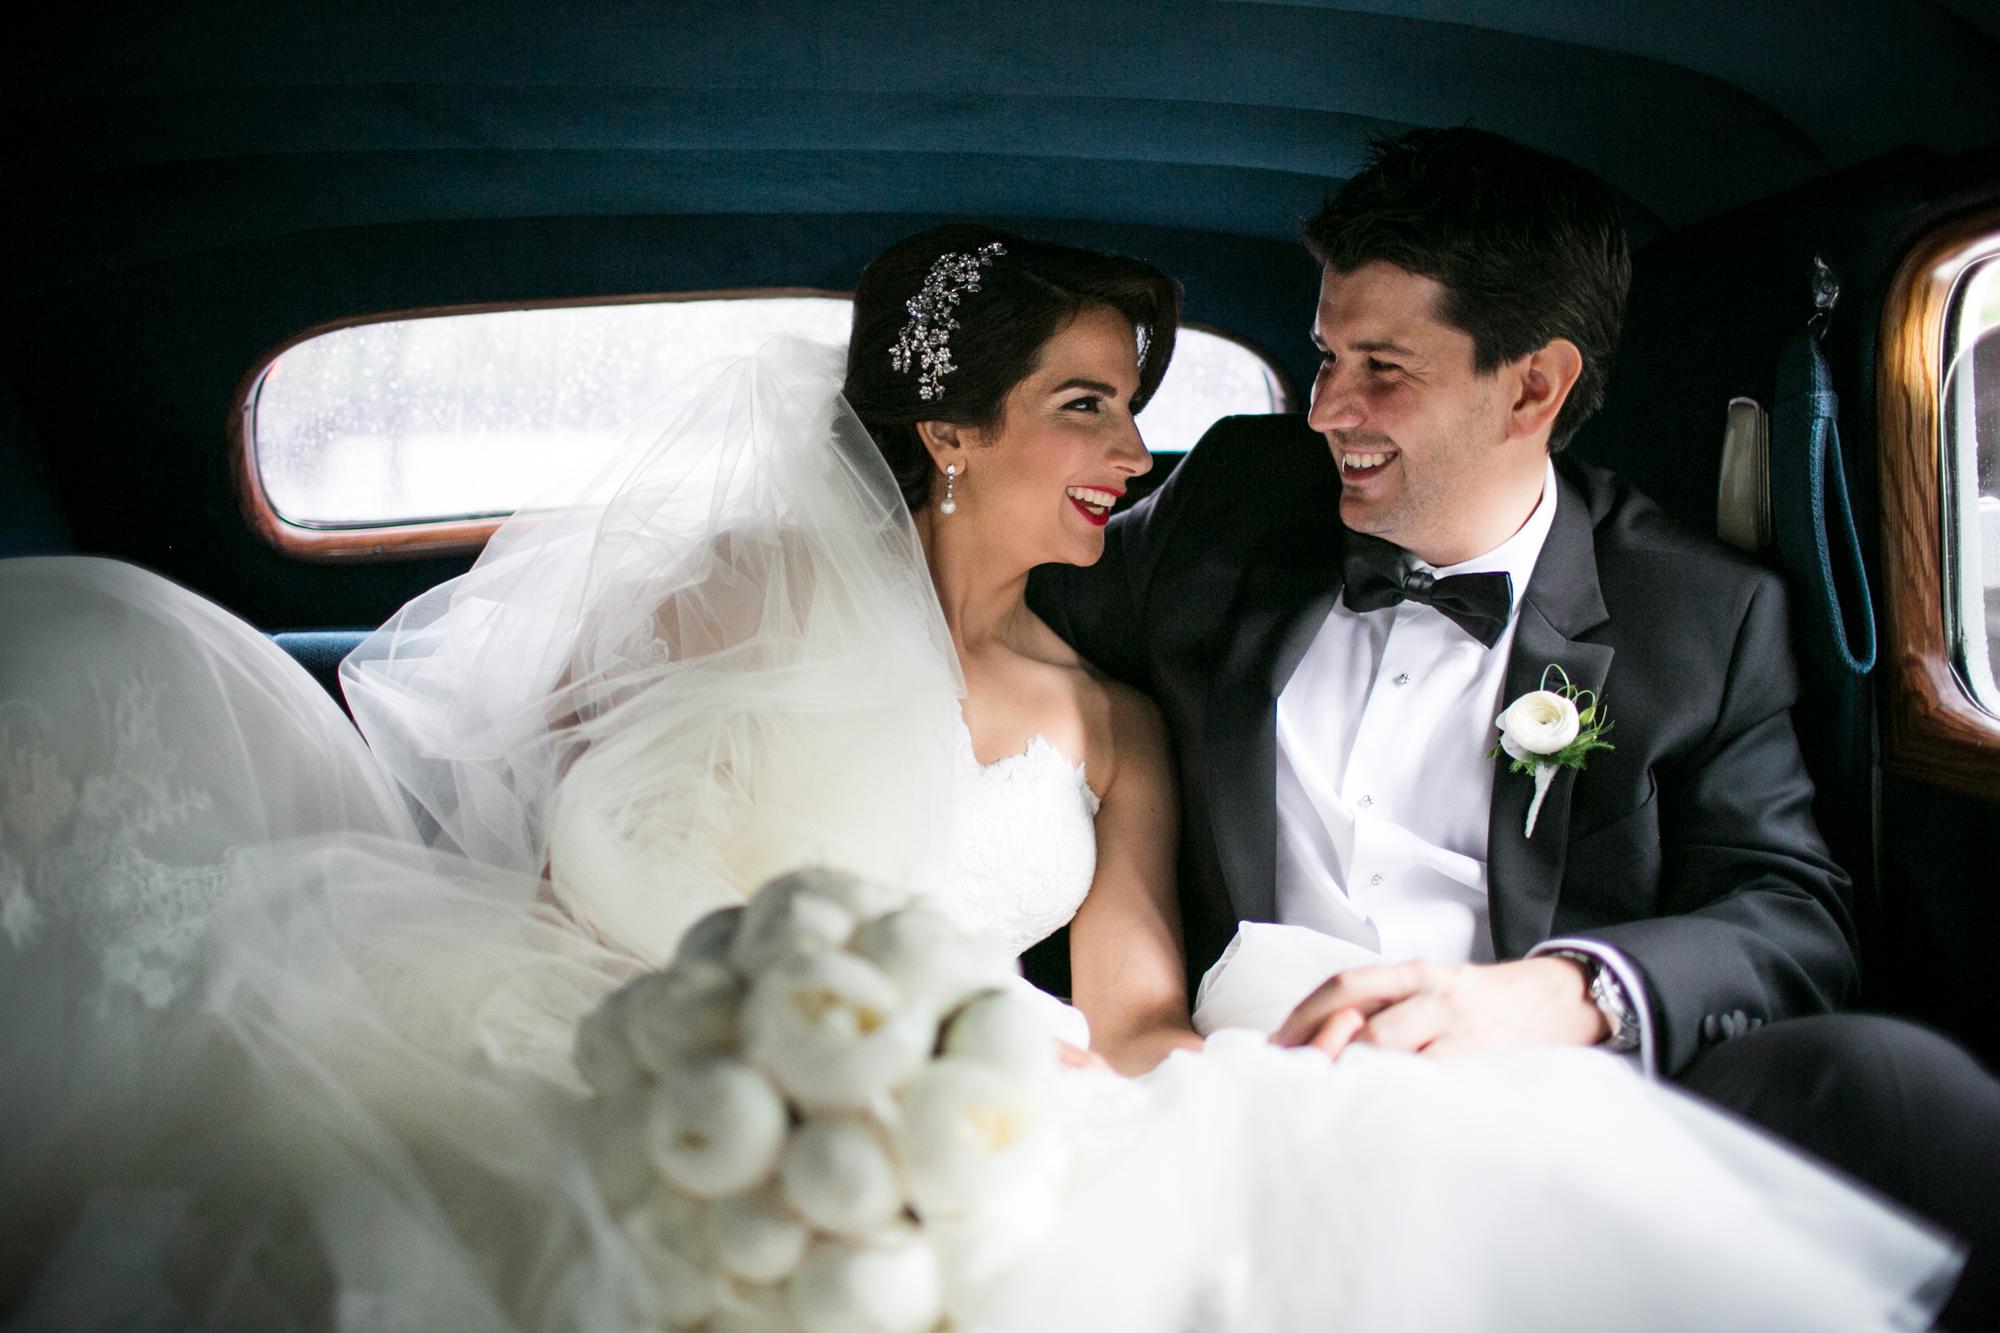 vancouver-luxury-wedding-photographer-lori-miles--10.jpg